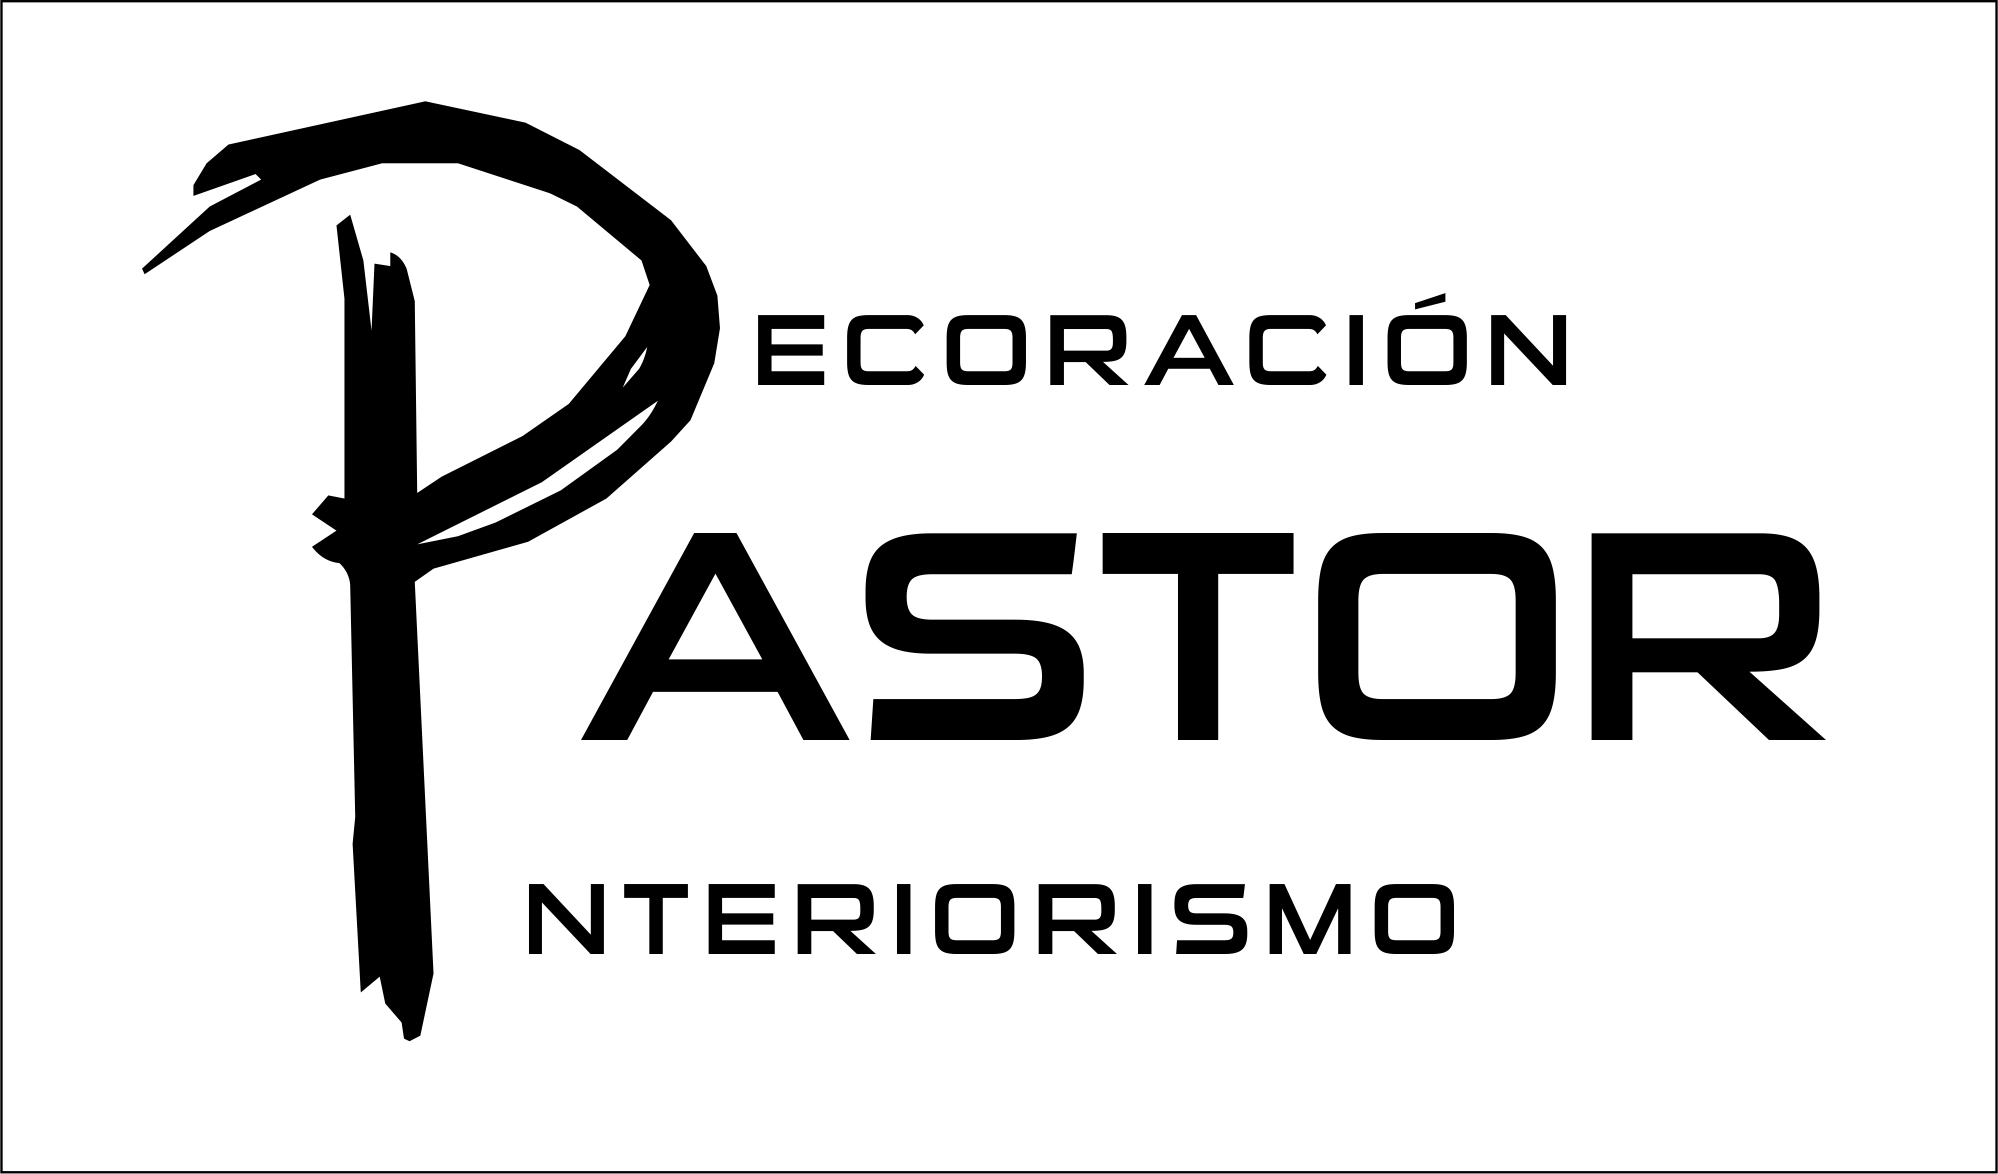 Pastor Decoracion&interiorismo